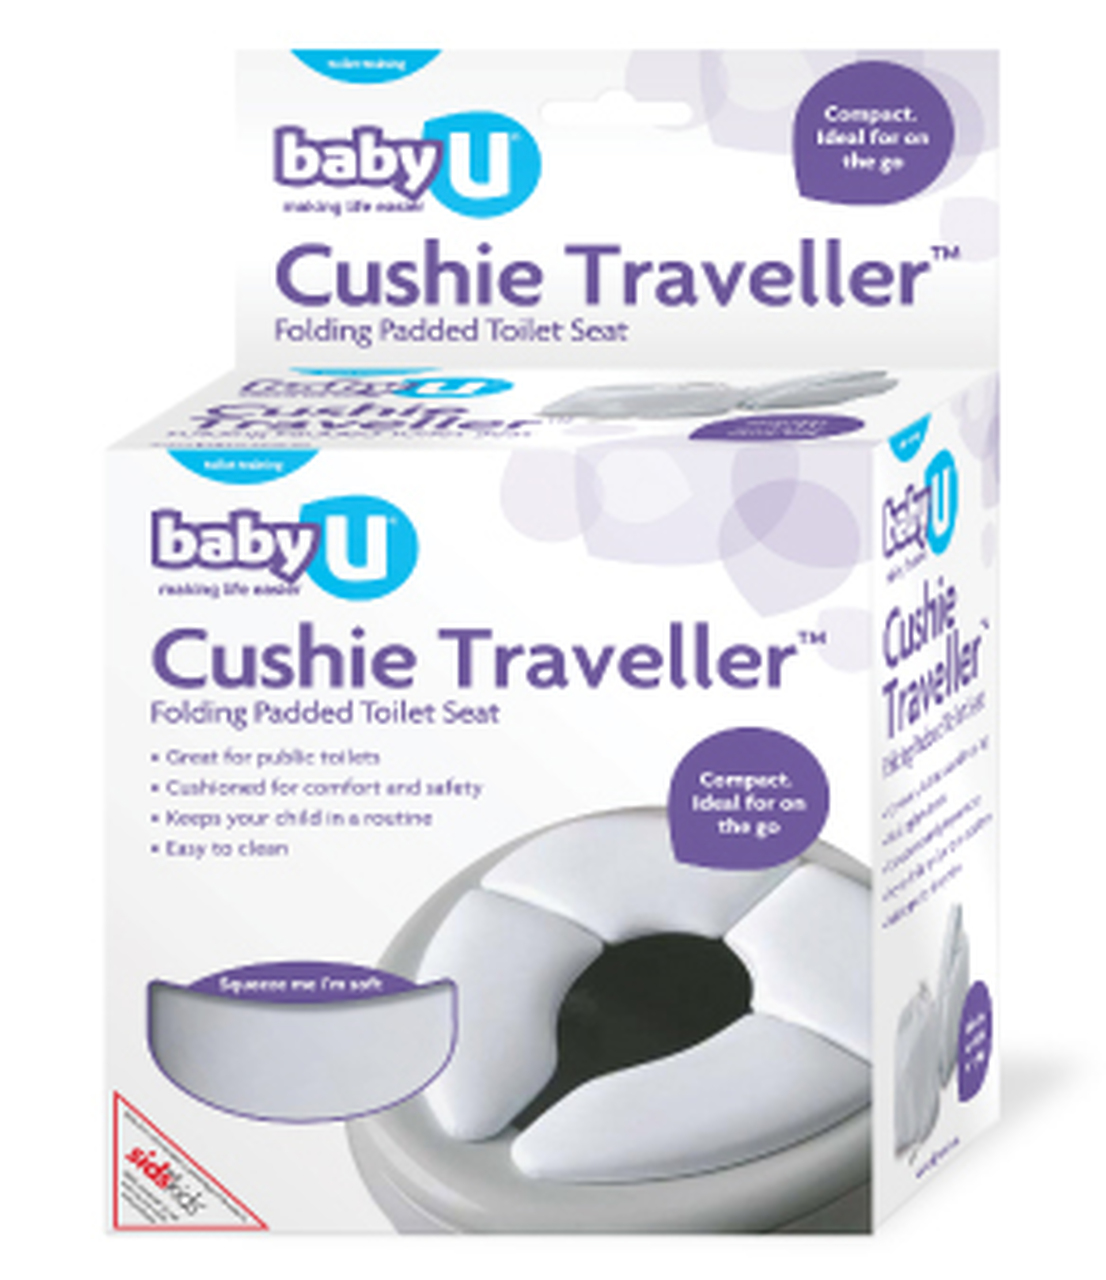 Baby U Cushie Traveller